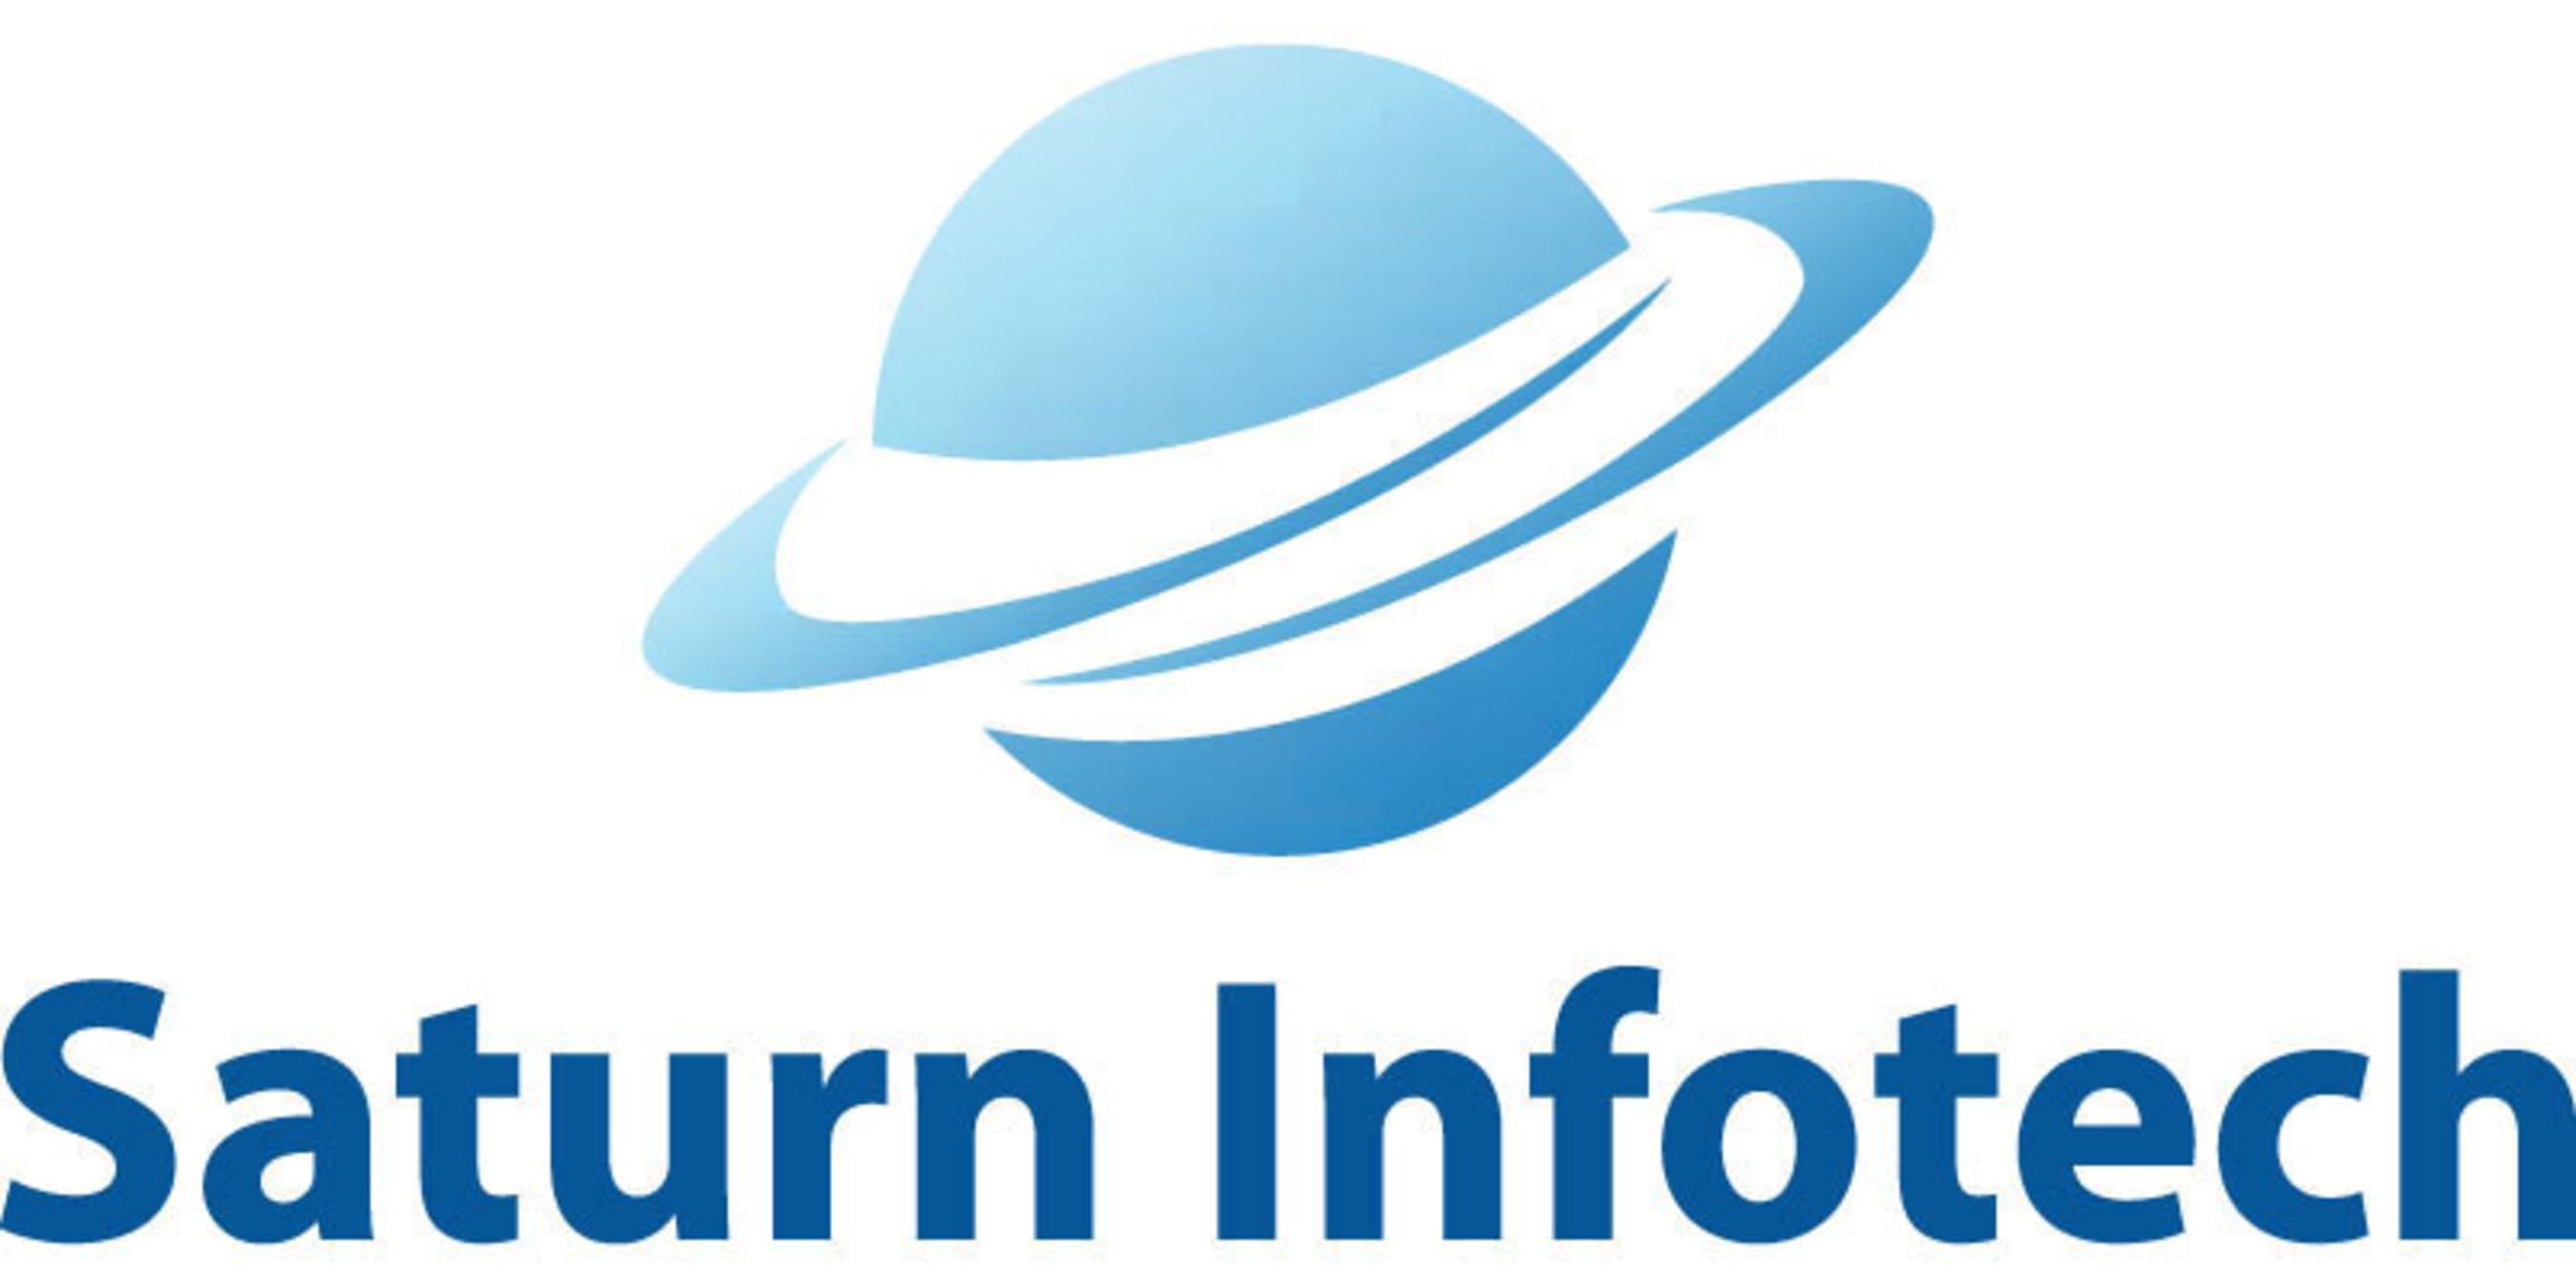 Saturn Infotech Improves Business Performance for Multi-billion Dollar Automotive Retail Chain